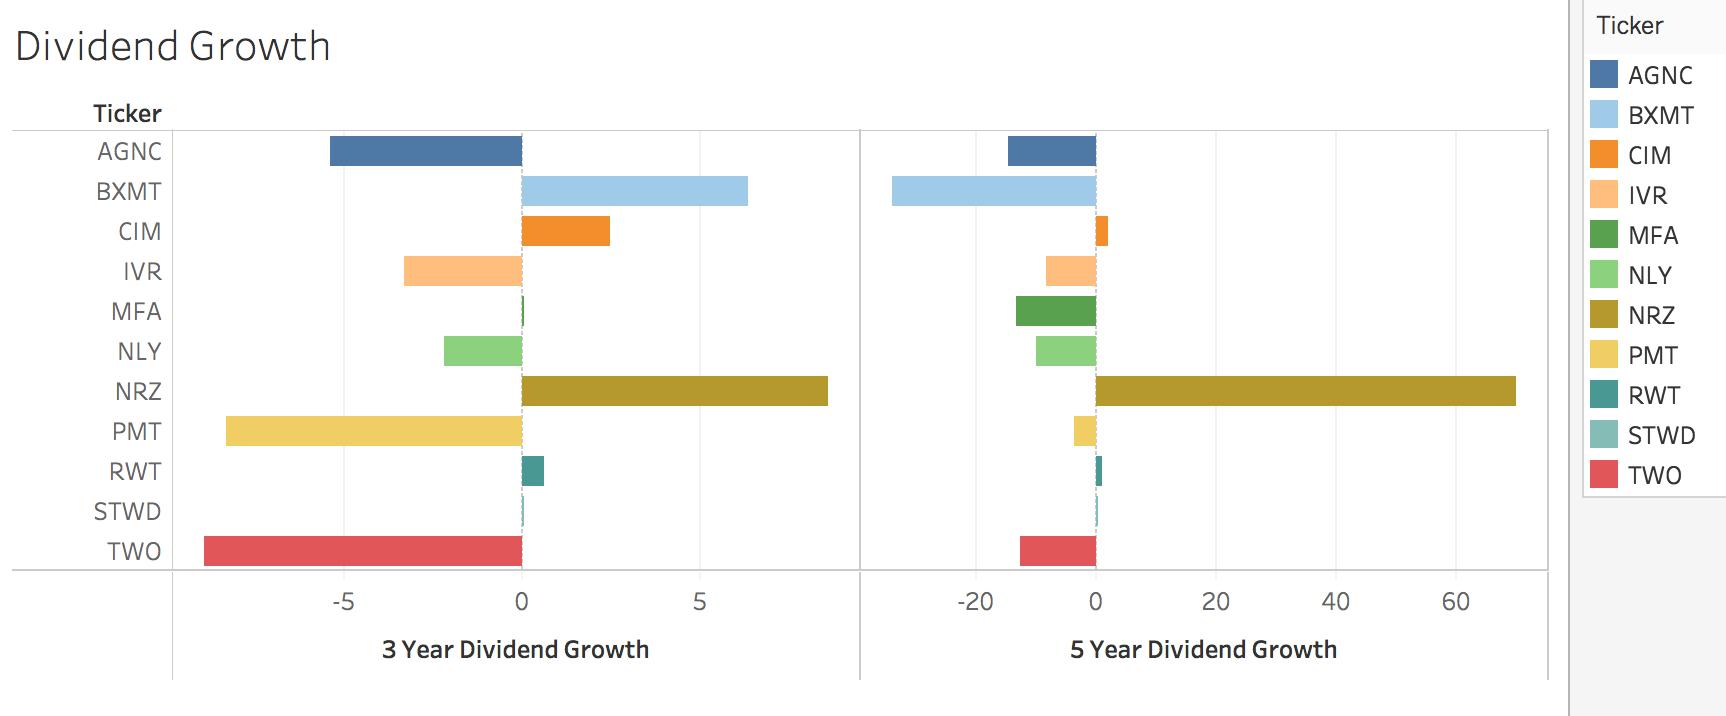 Data And Analysis For All Big Mreits | Seeking Alpha